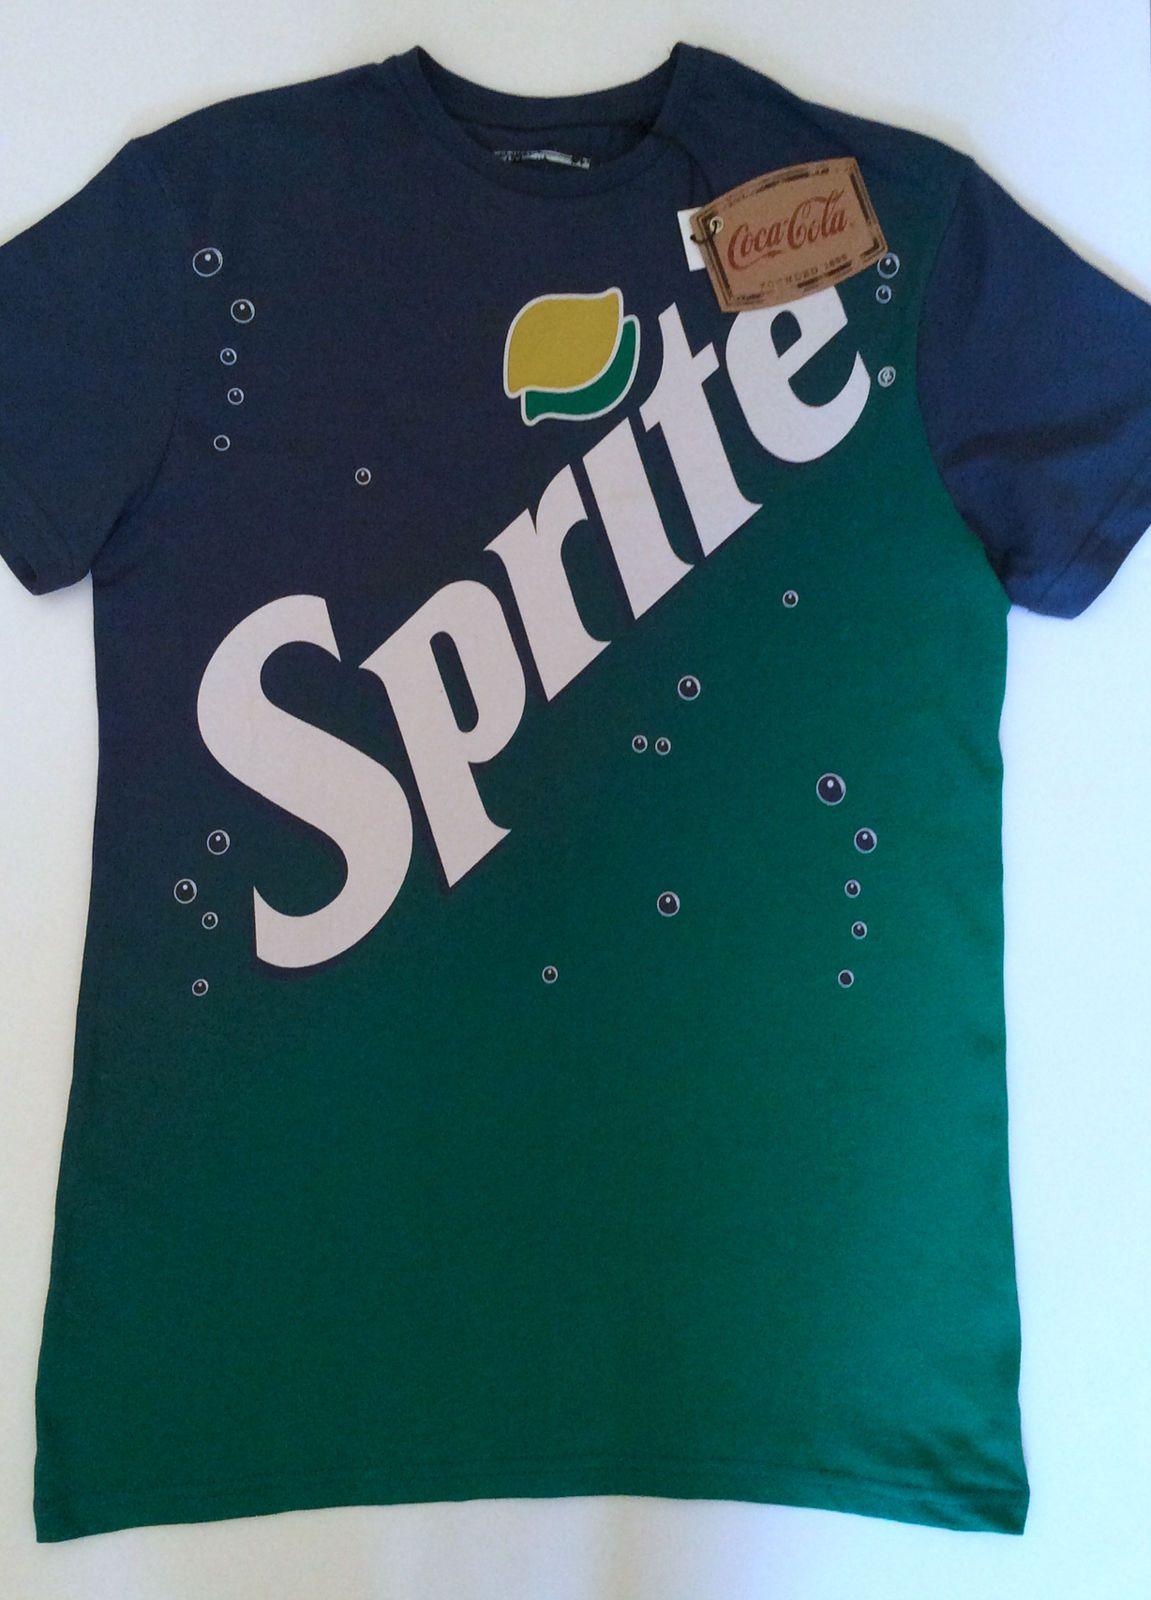 6a3a3e53 Mens Official Licensed Coca Cola SPRITE soda LOGO Slogan T Shirt from  Primark | eBay